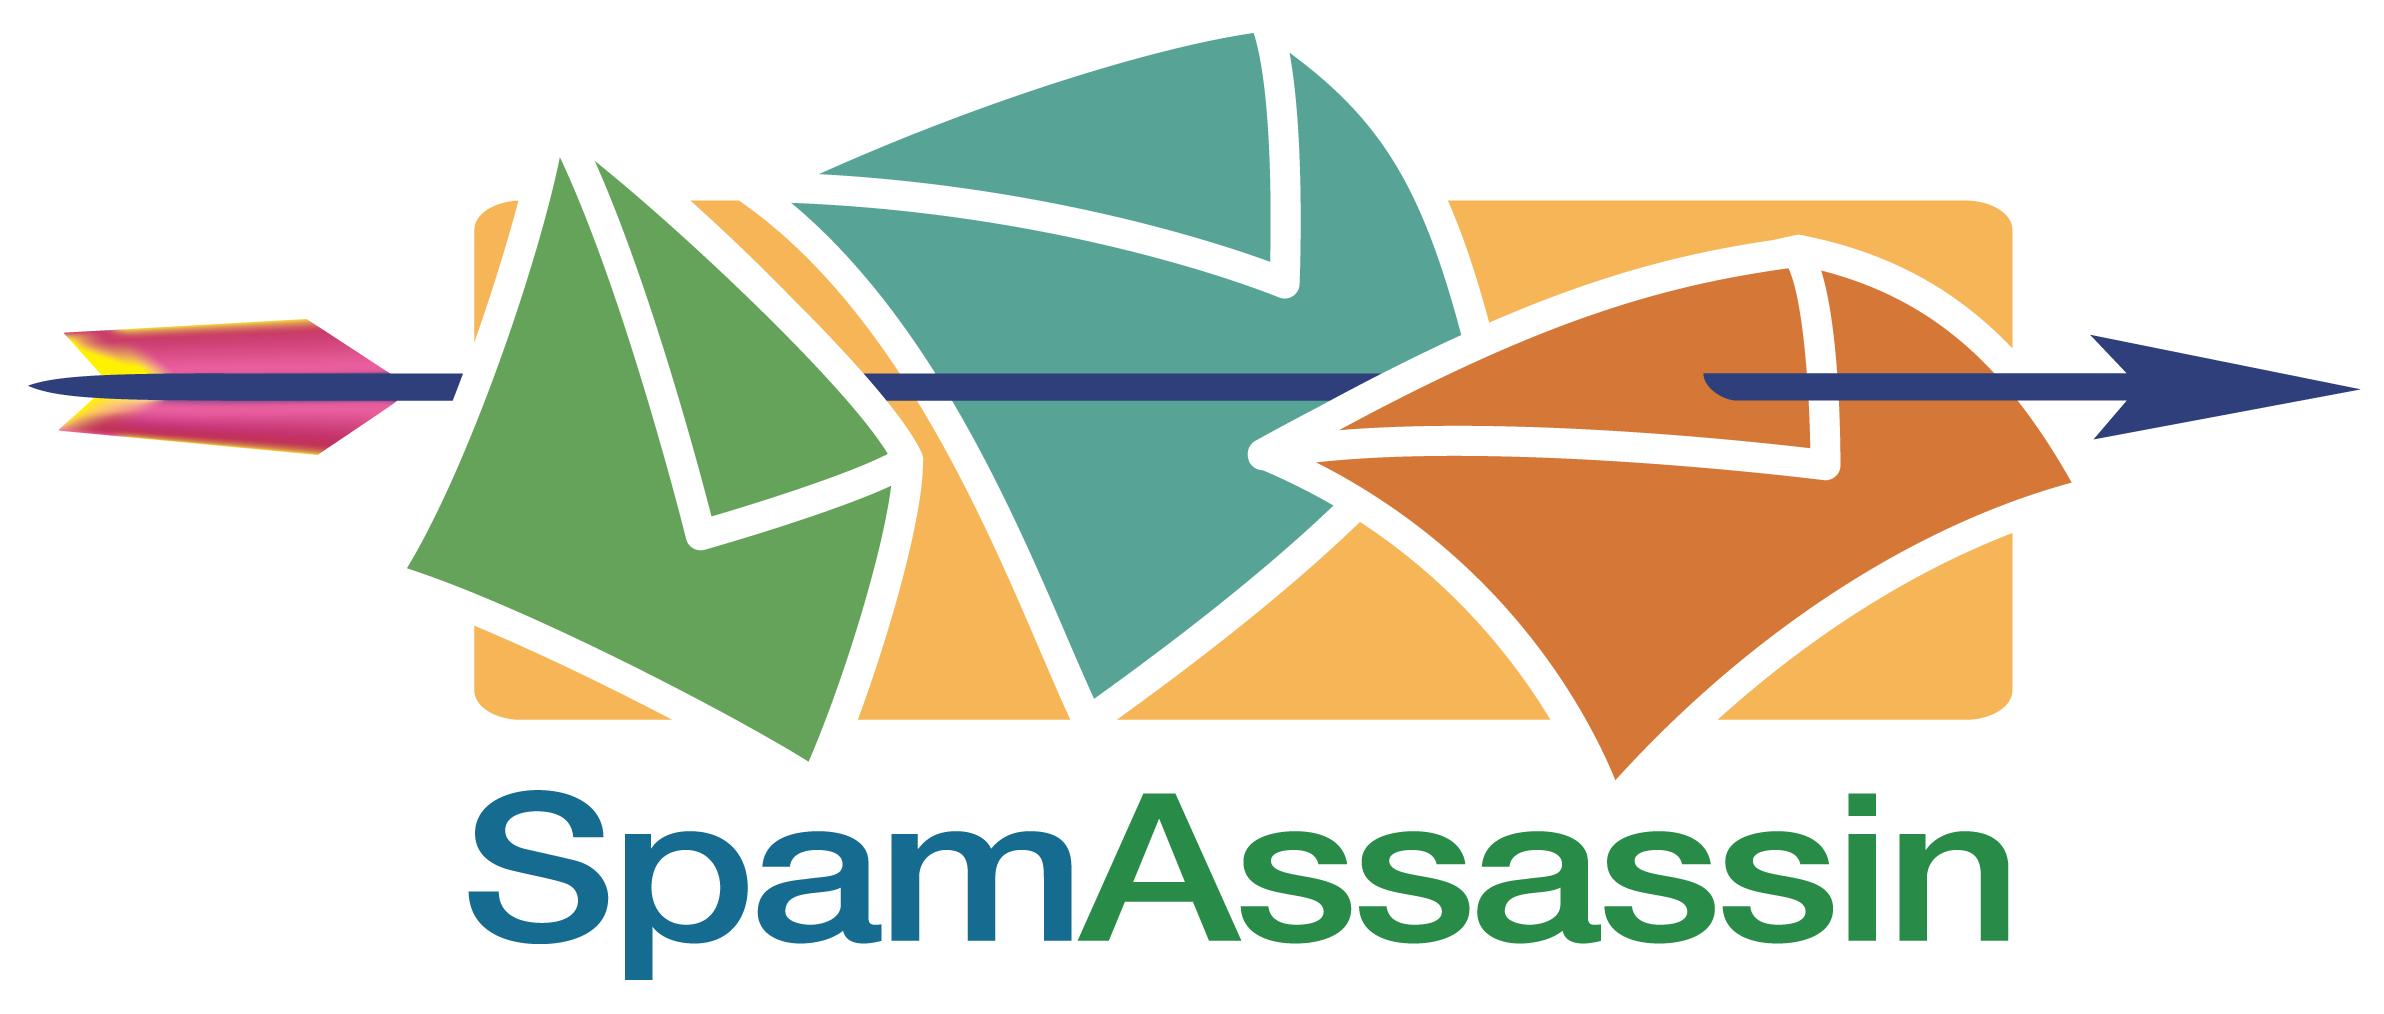 Como habilitar e configurar o SpamAssassin